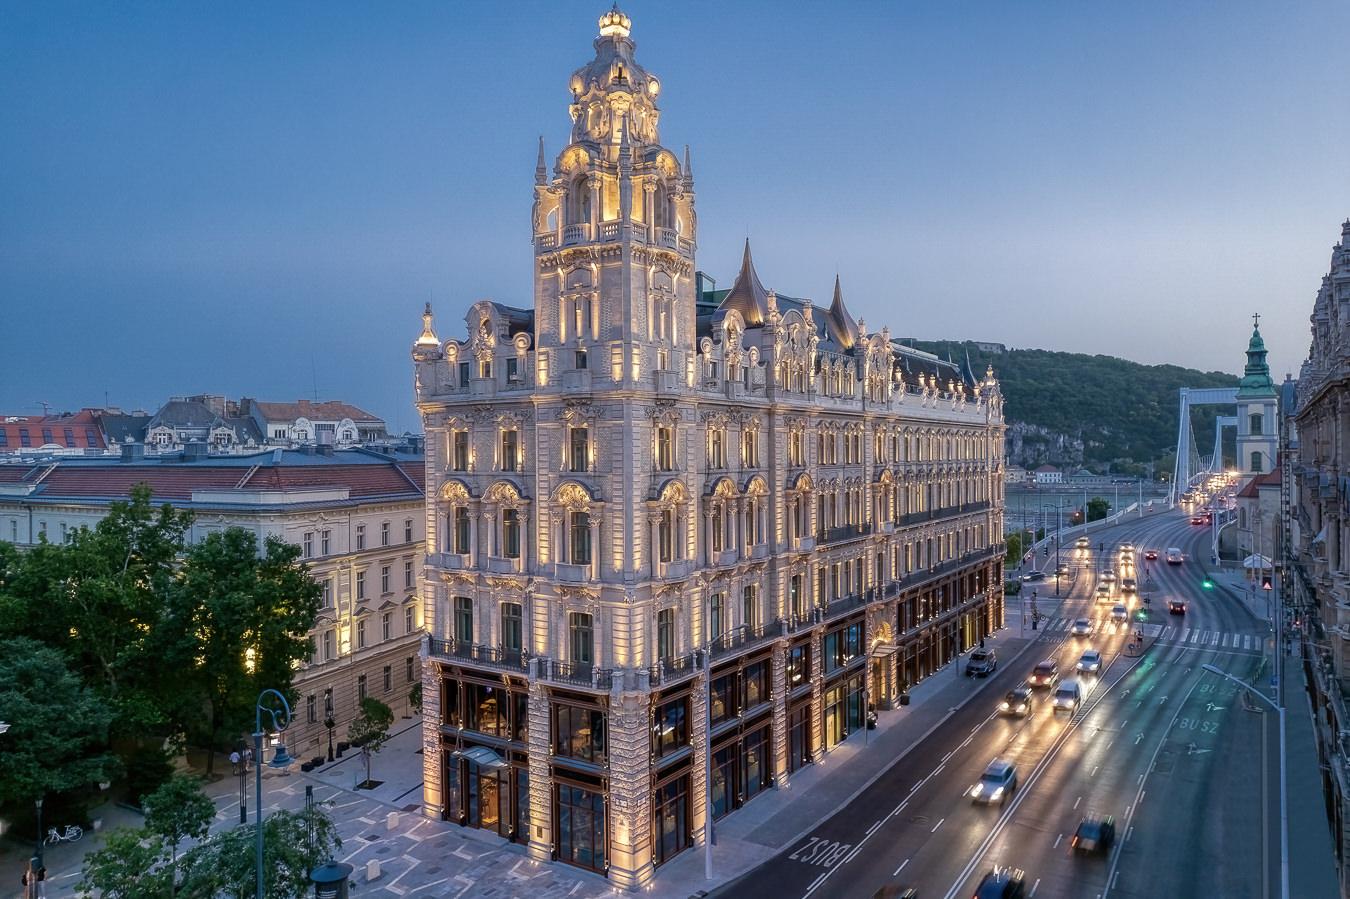 Matild Palace a Luxury Collection Hotel, Budapest, Γιώργος Φάκαρος - Αρχιτεκτονική Φωτογραφία | Εσωτερικοί Χώροι | Φωτογραφία Ξενοδοχειών - Photography / Φωτογραφία